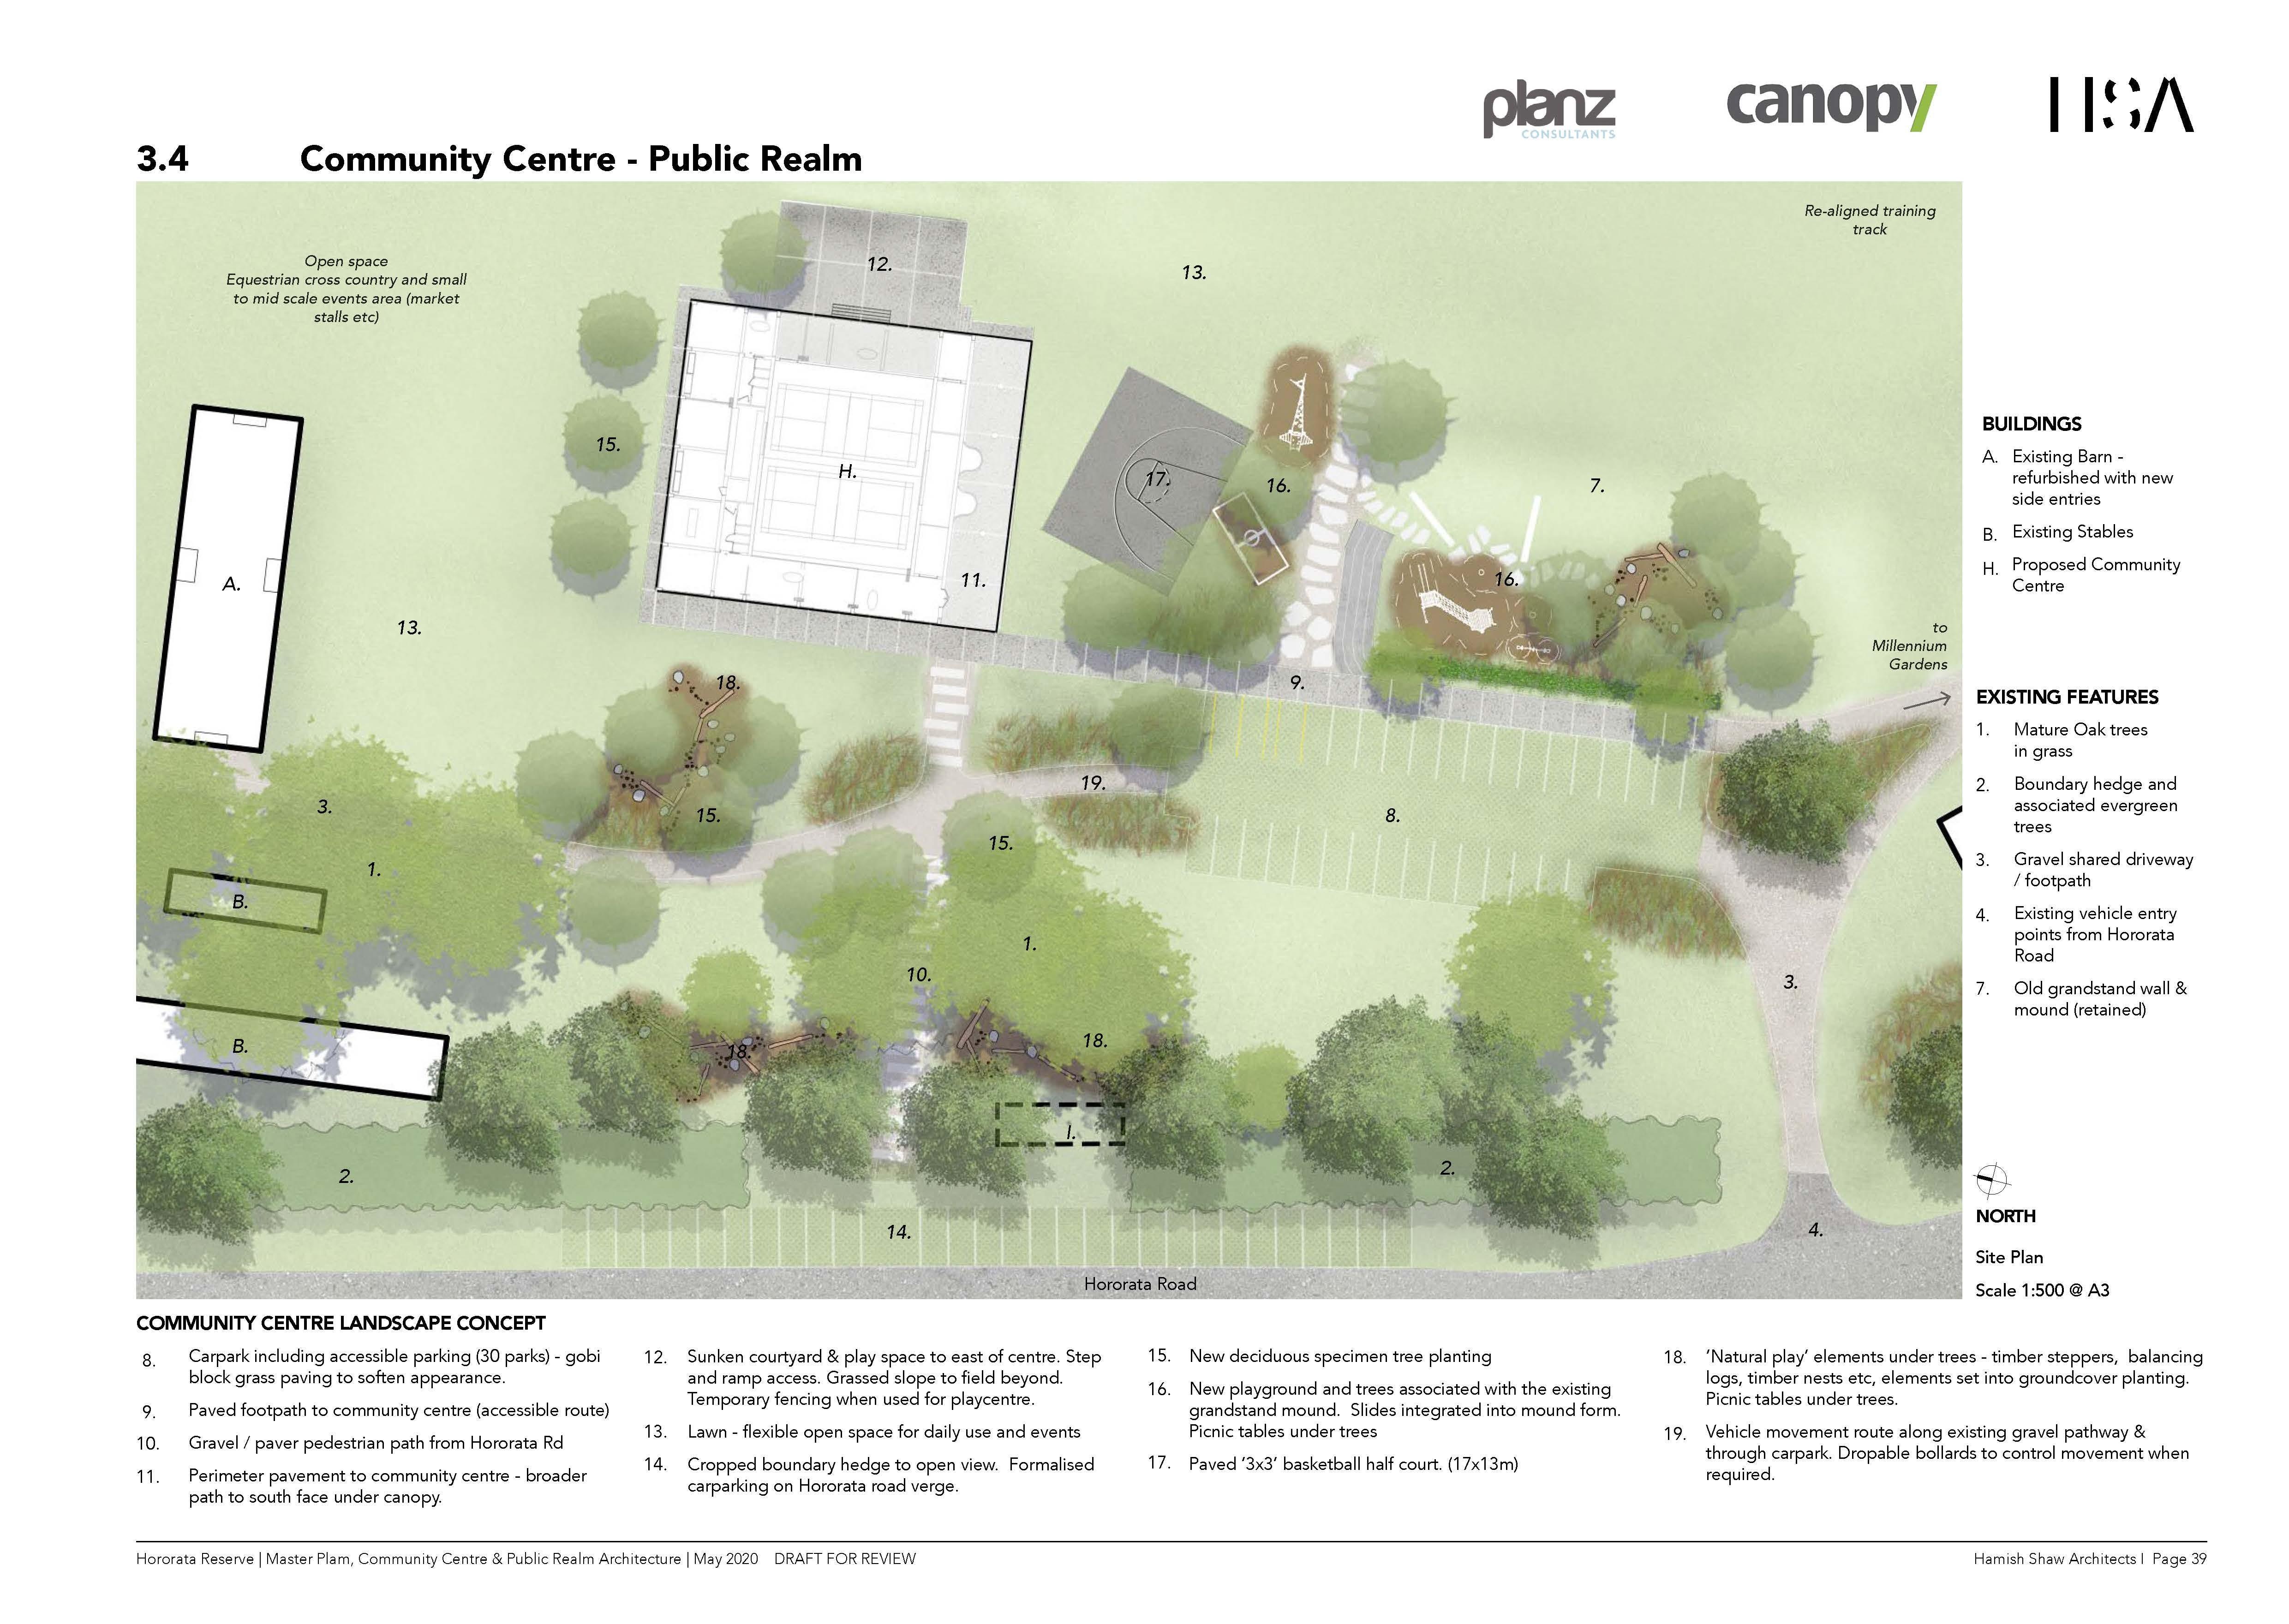 Community Centre - Public realm